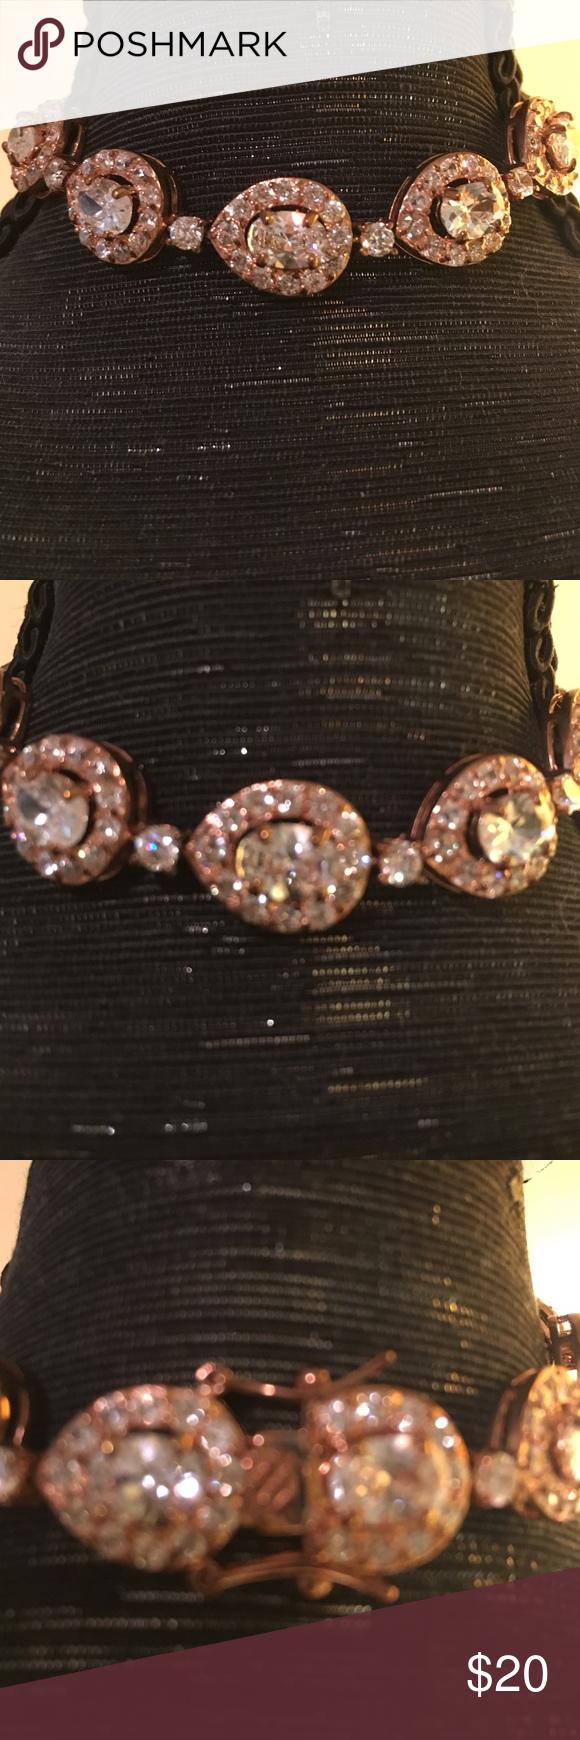 New Rose gold rhinestone bracelet NWT Jewelry bracelets Rose